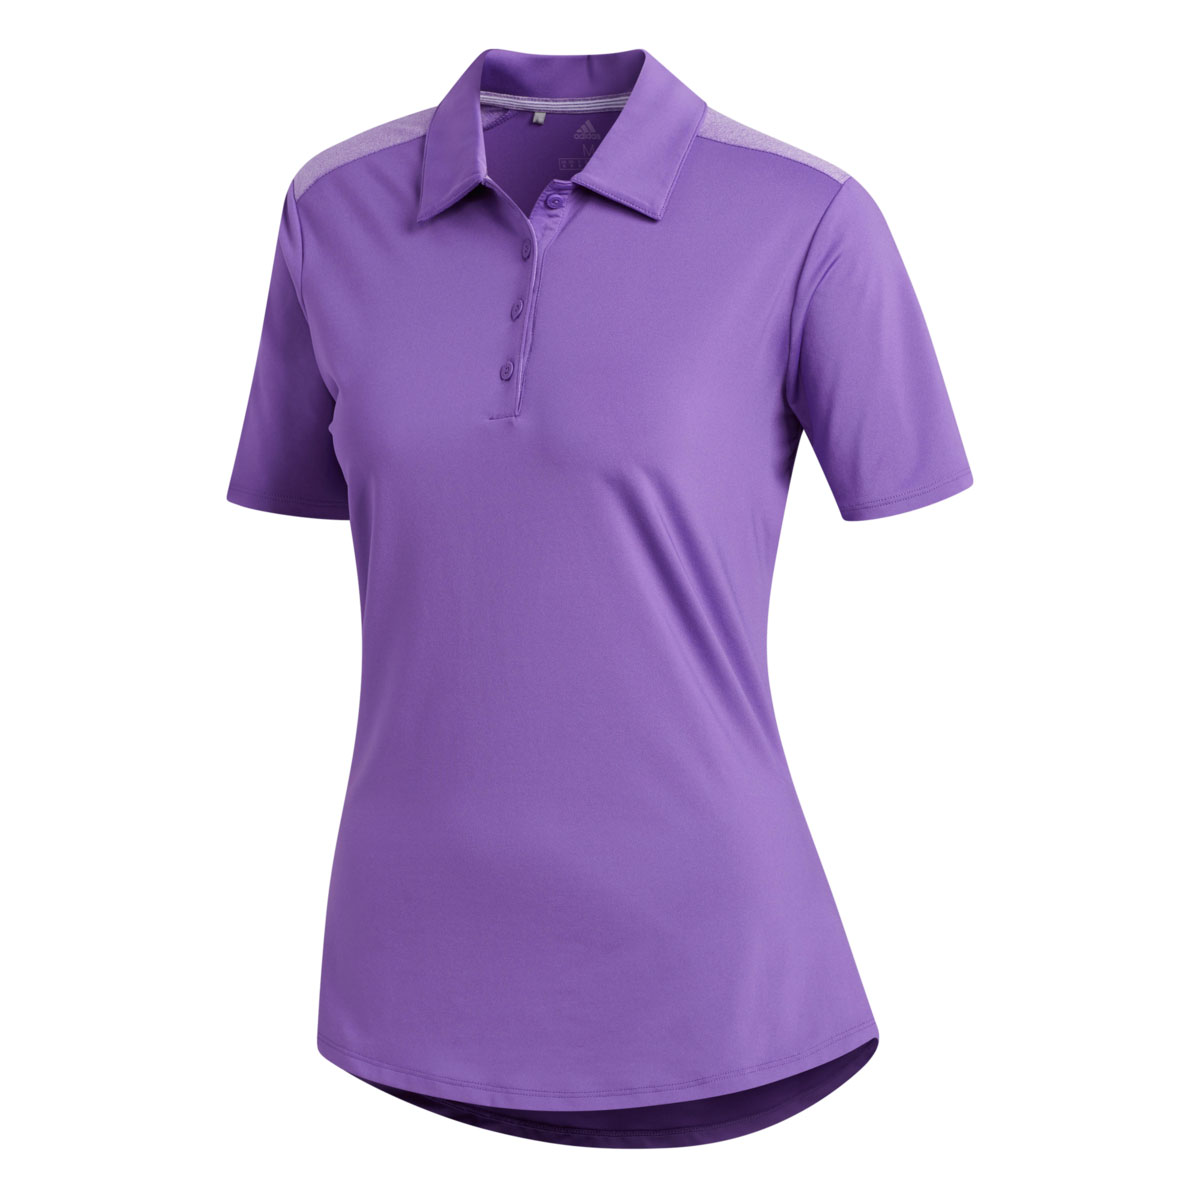 Adidas Women's Ultimate Heathered Purple Polo